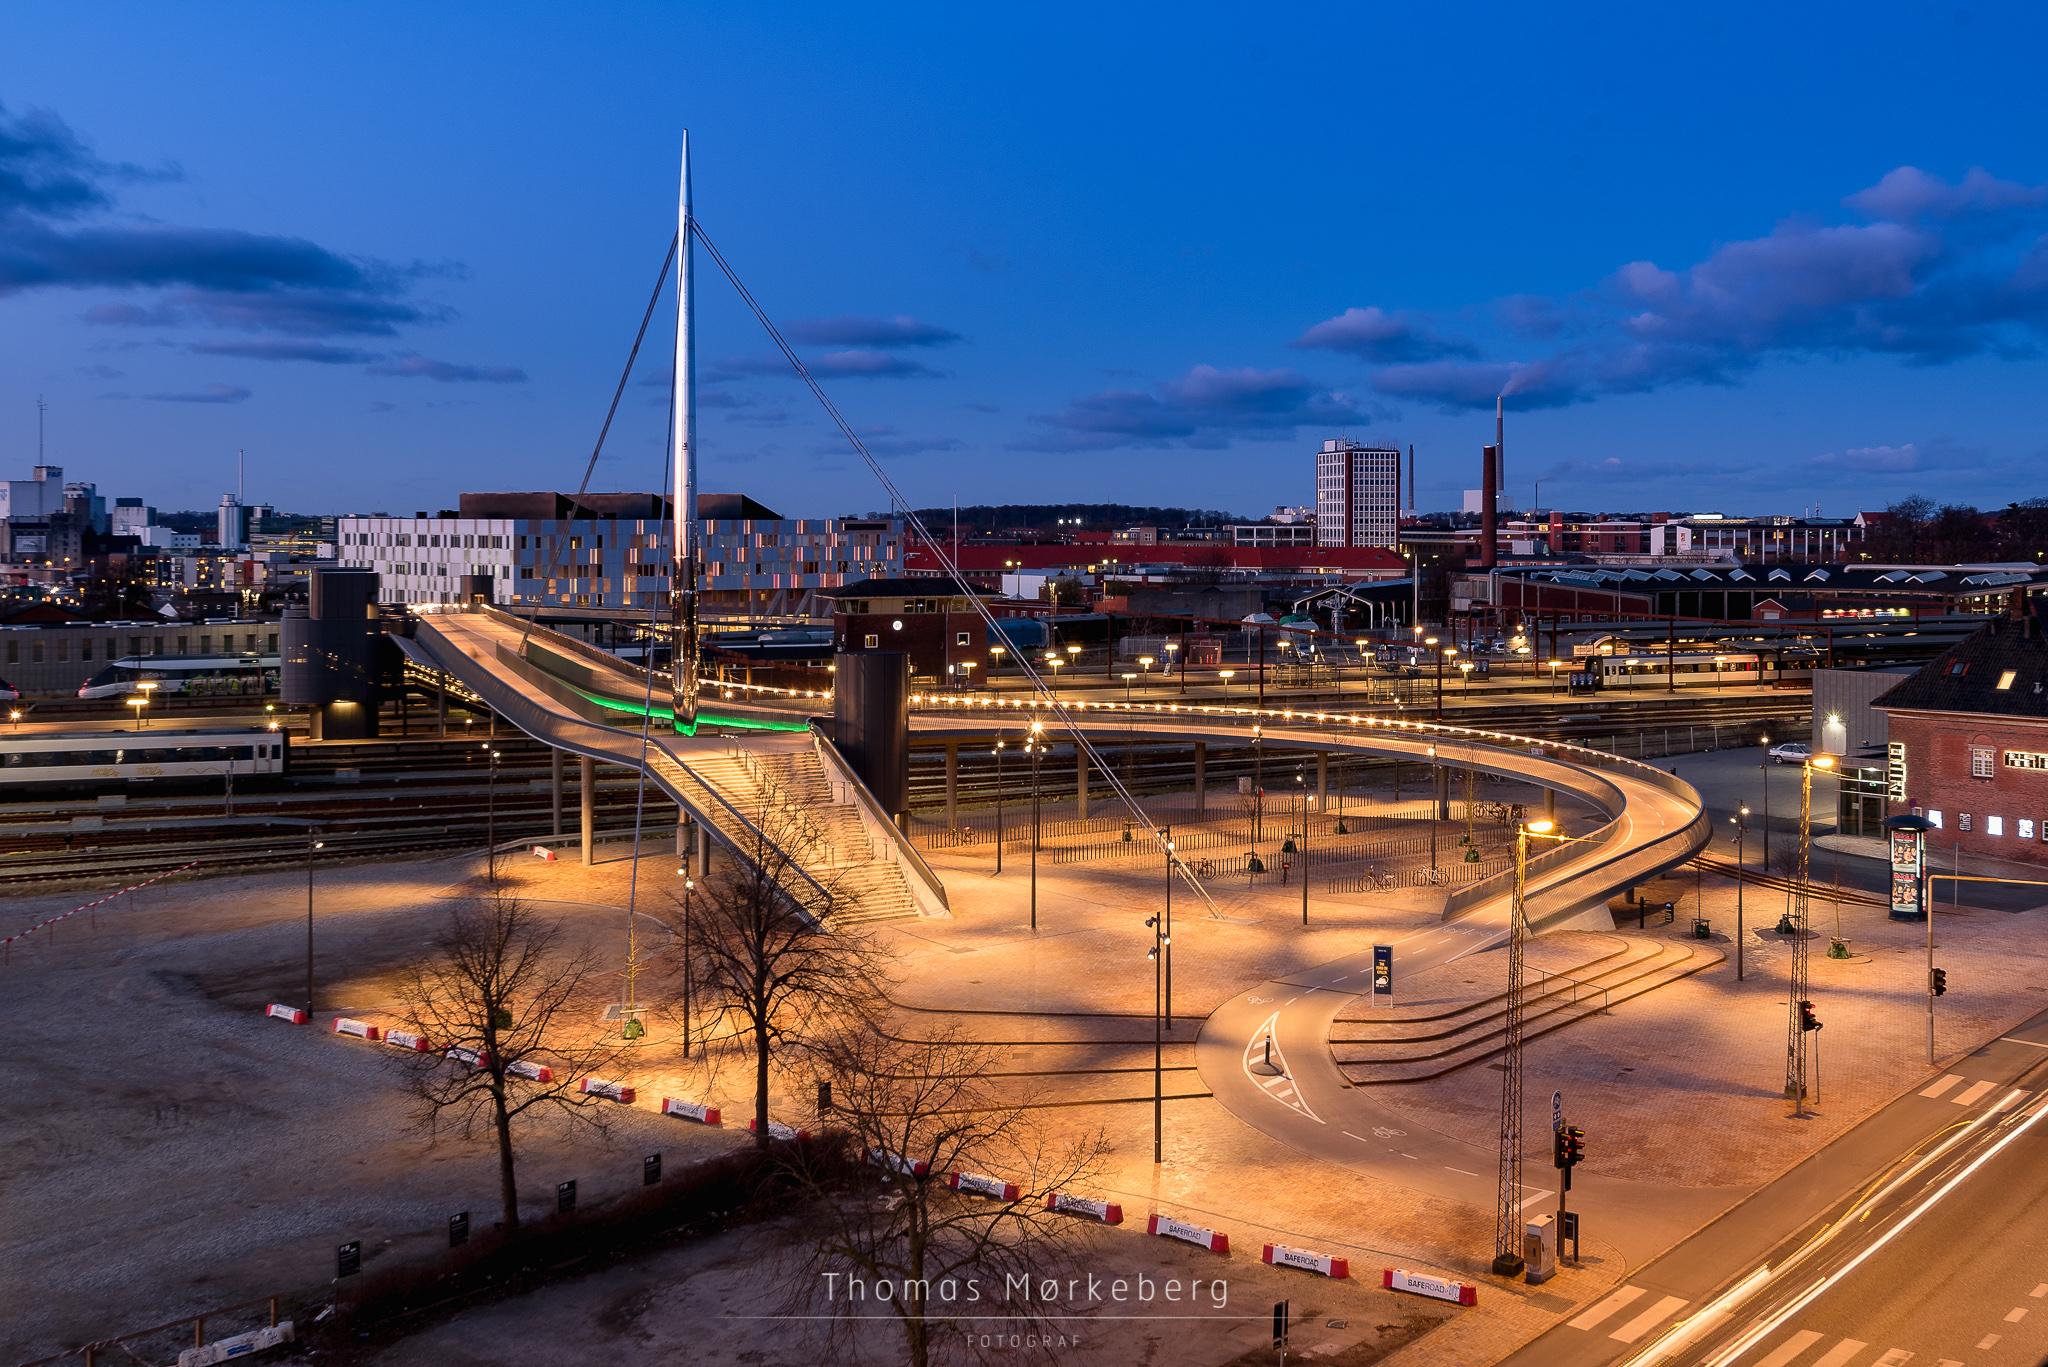 City bridge in Odense at twilight